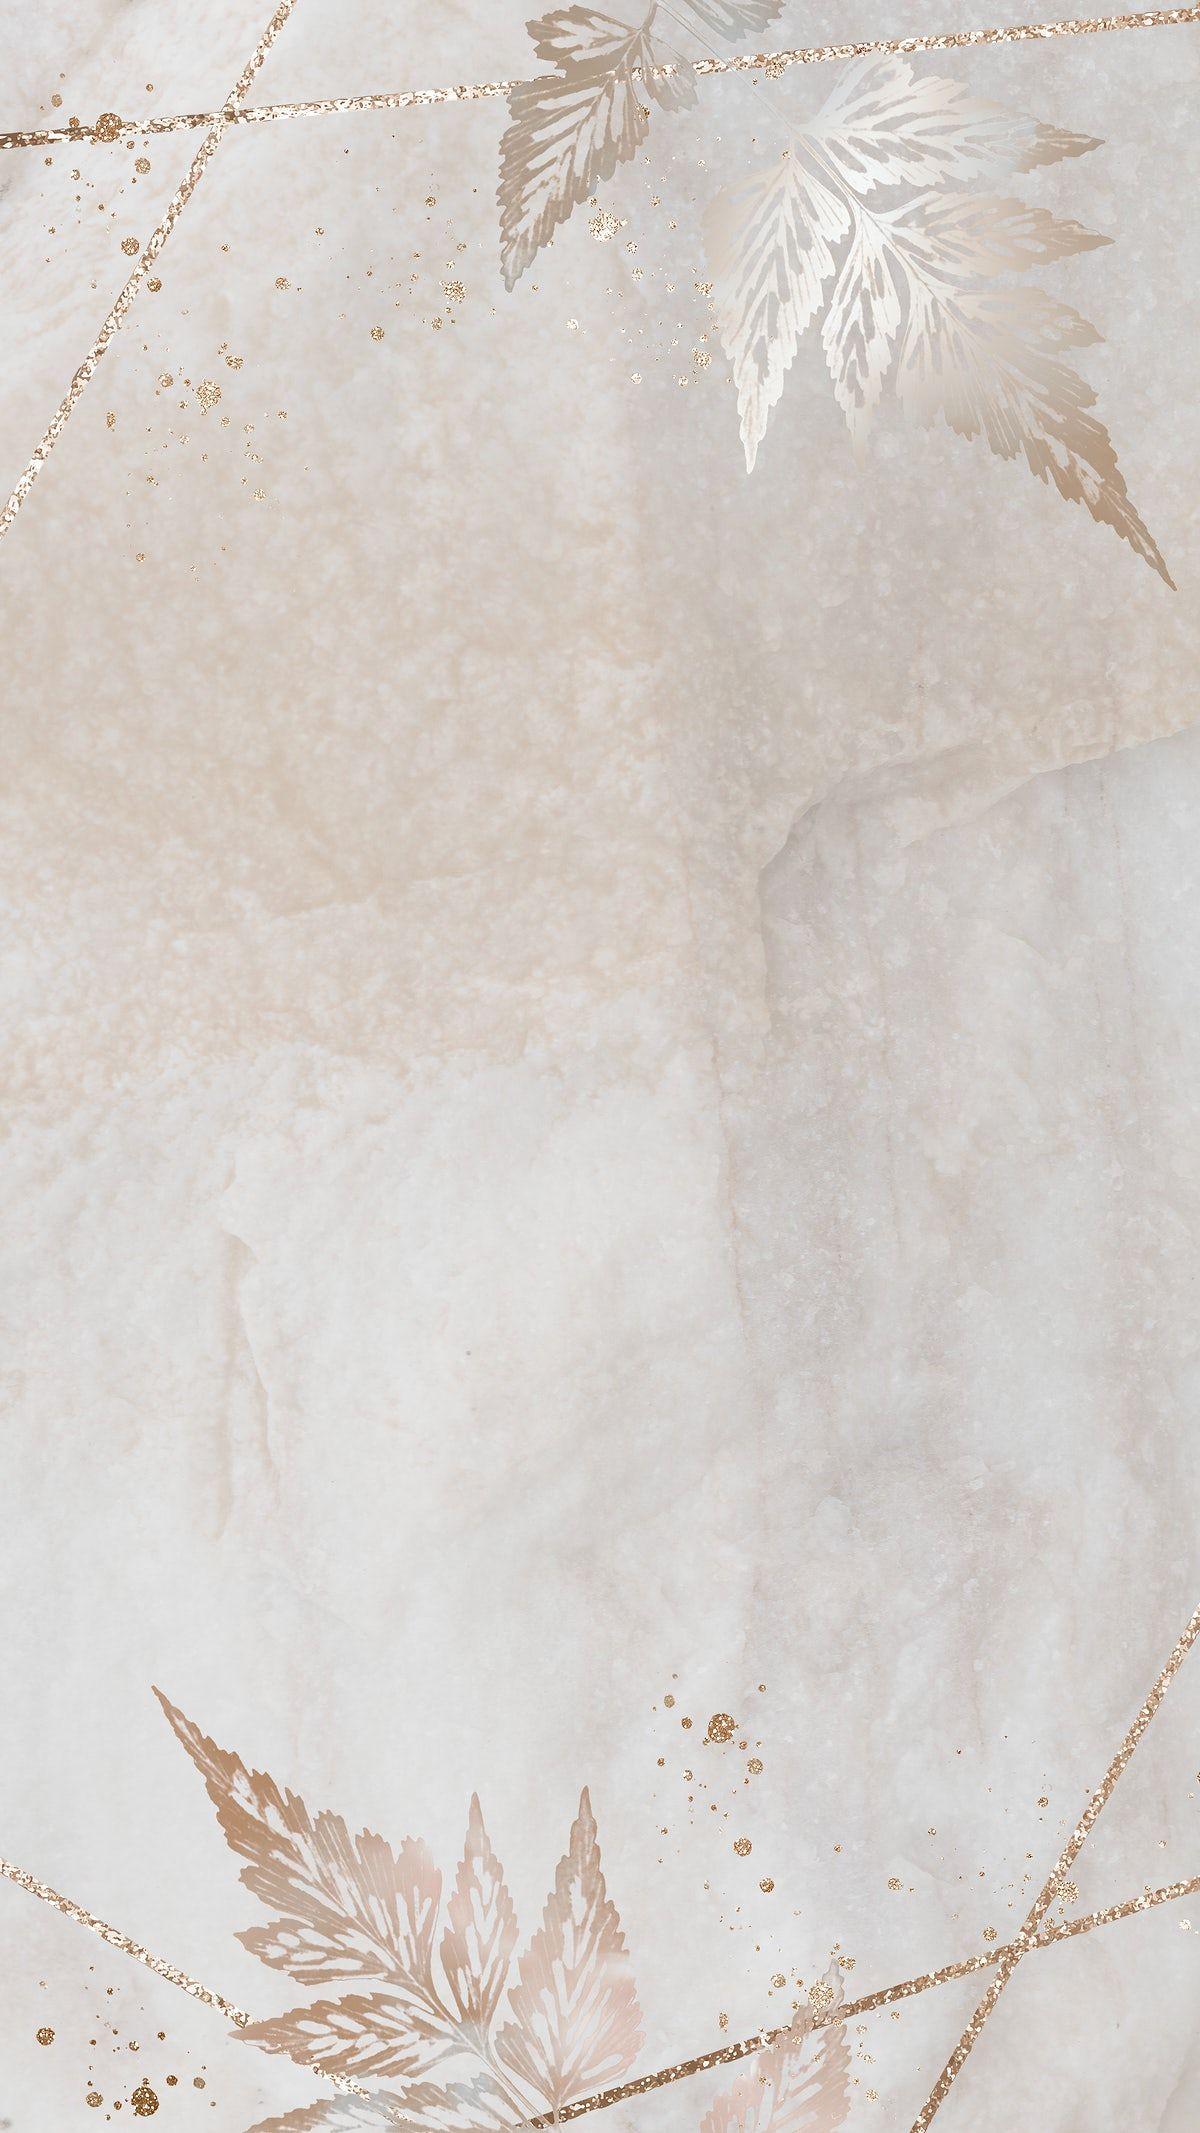 Download premium illustration of Glittery sickle spleenwort frame mobile